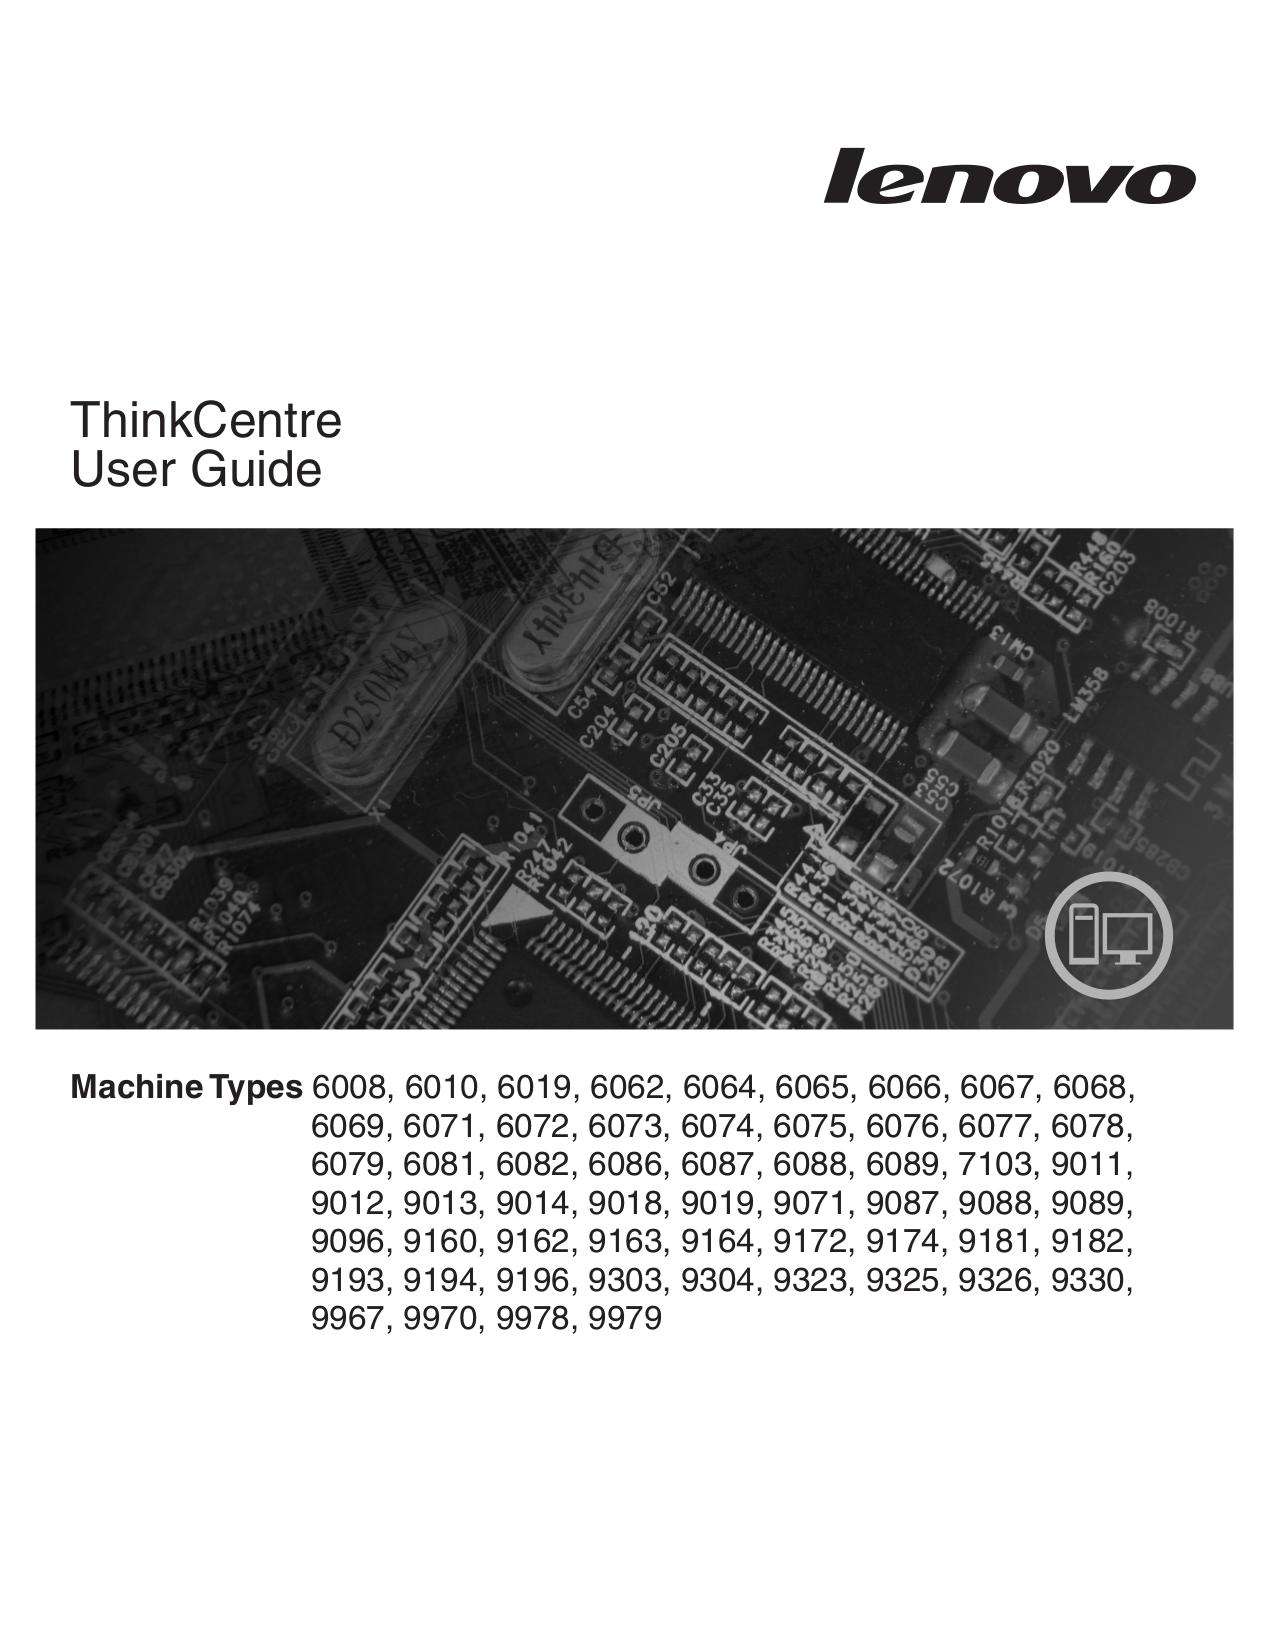 pdf for Lenovo Desktop ThinkCentre M57p 9967 manual